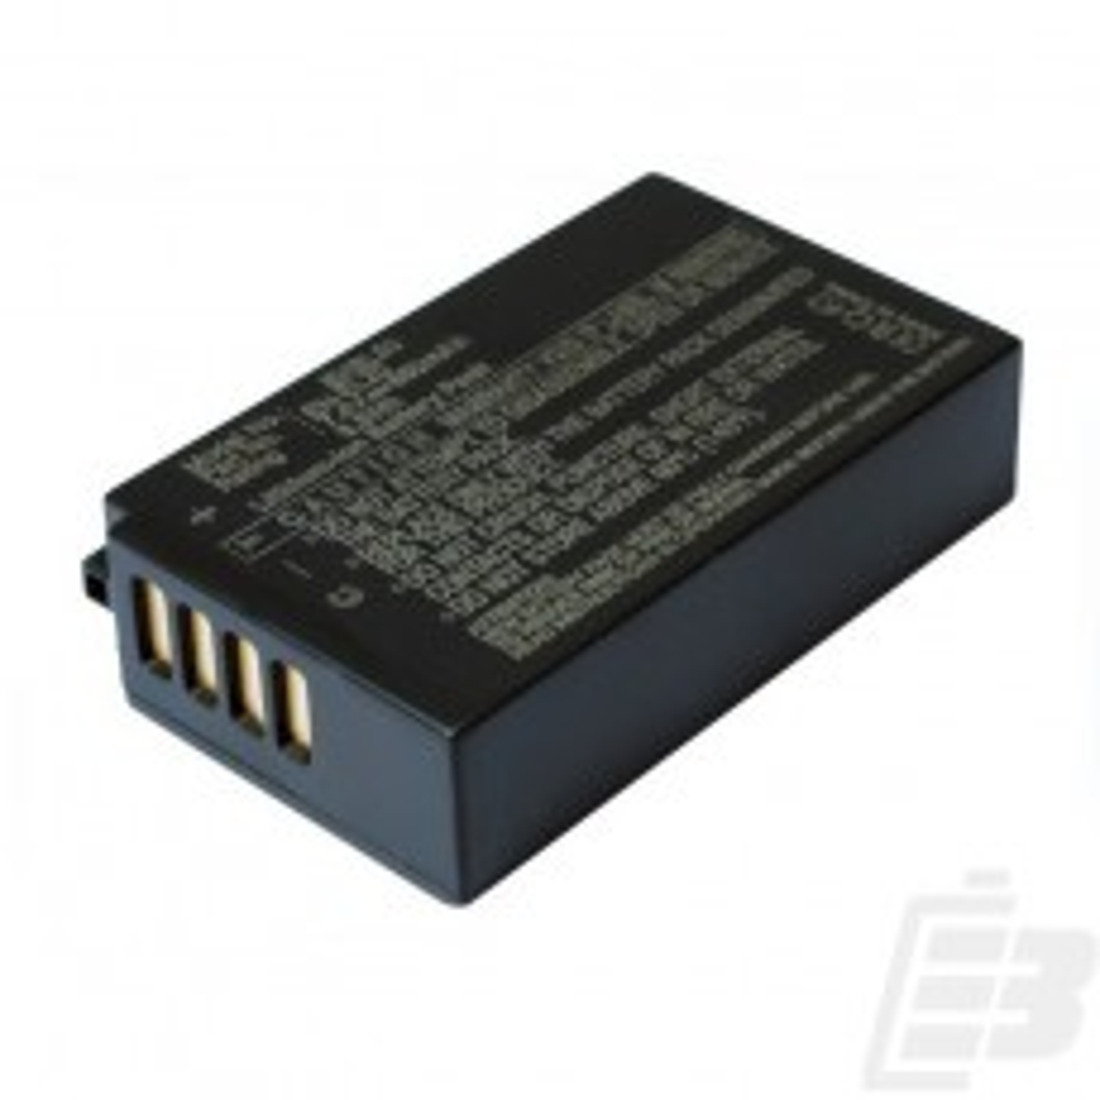 Camcorder battery Blackmagic Design Pocket Cinema Camera_1